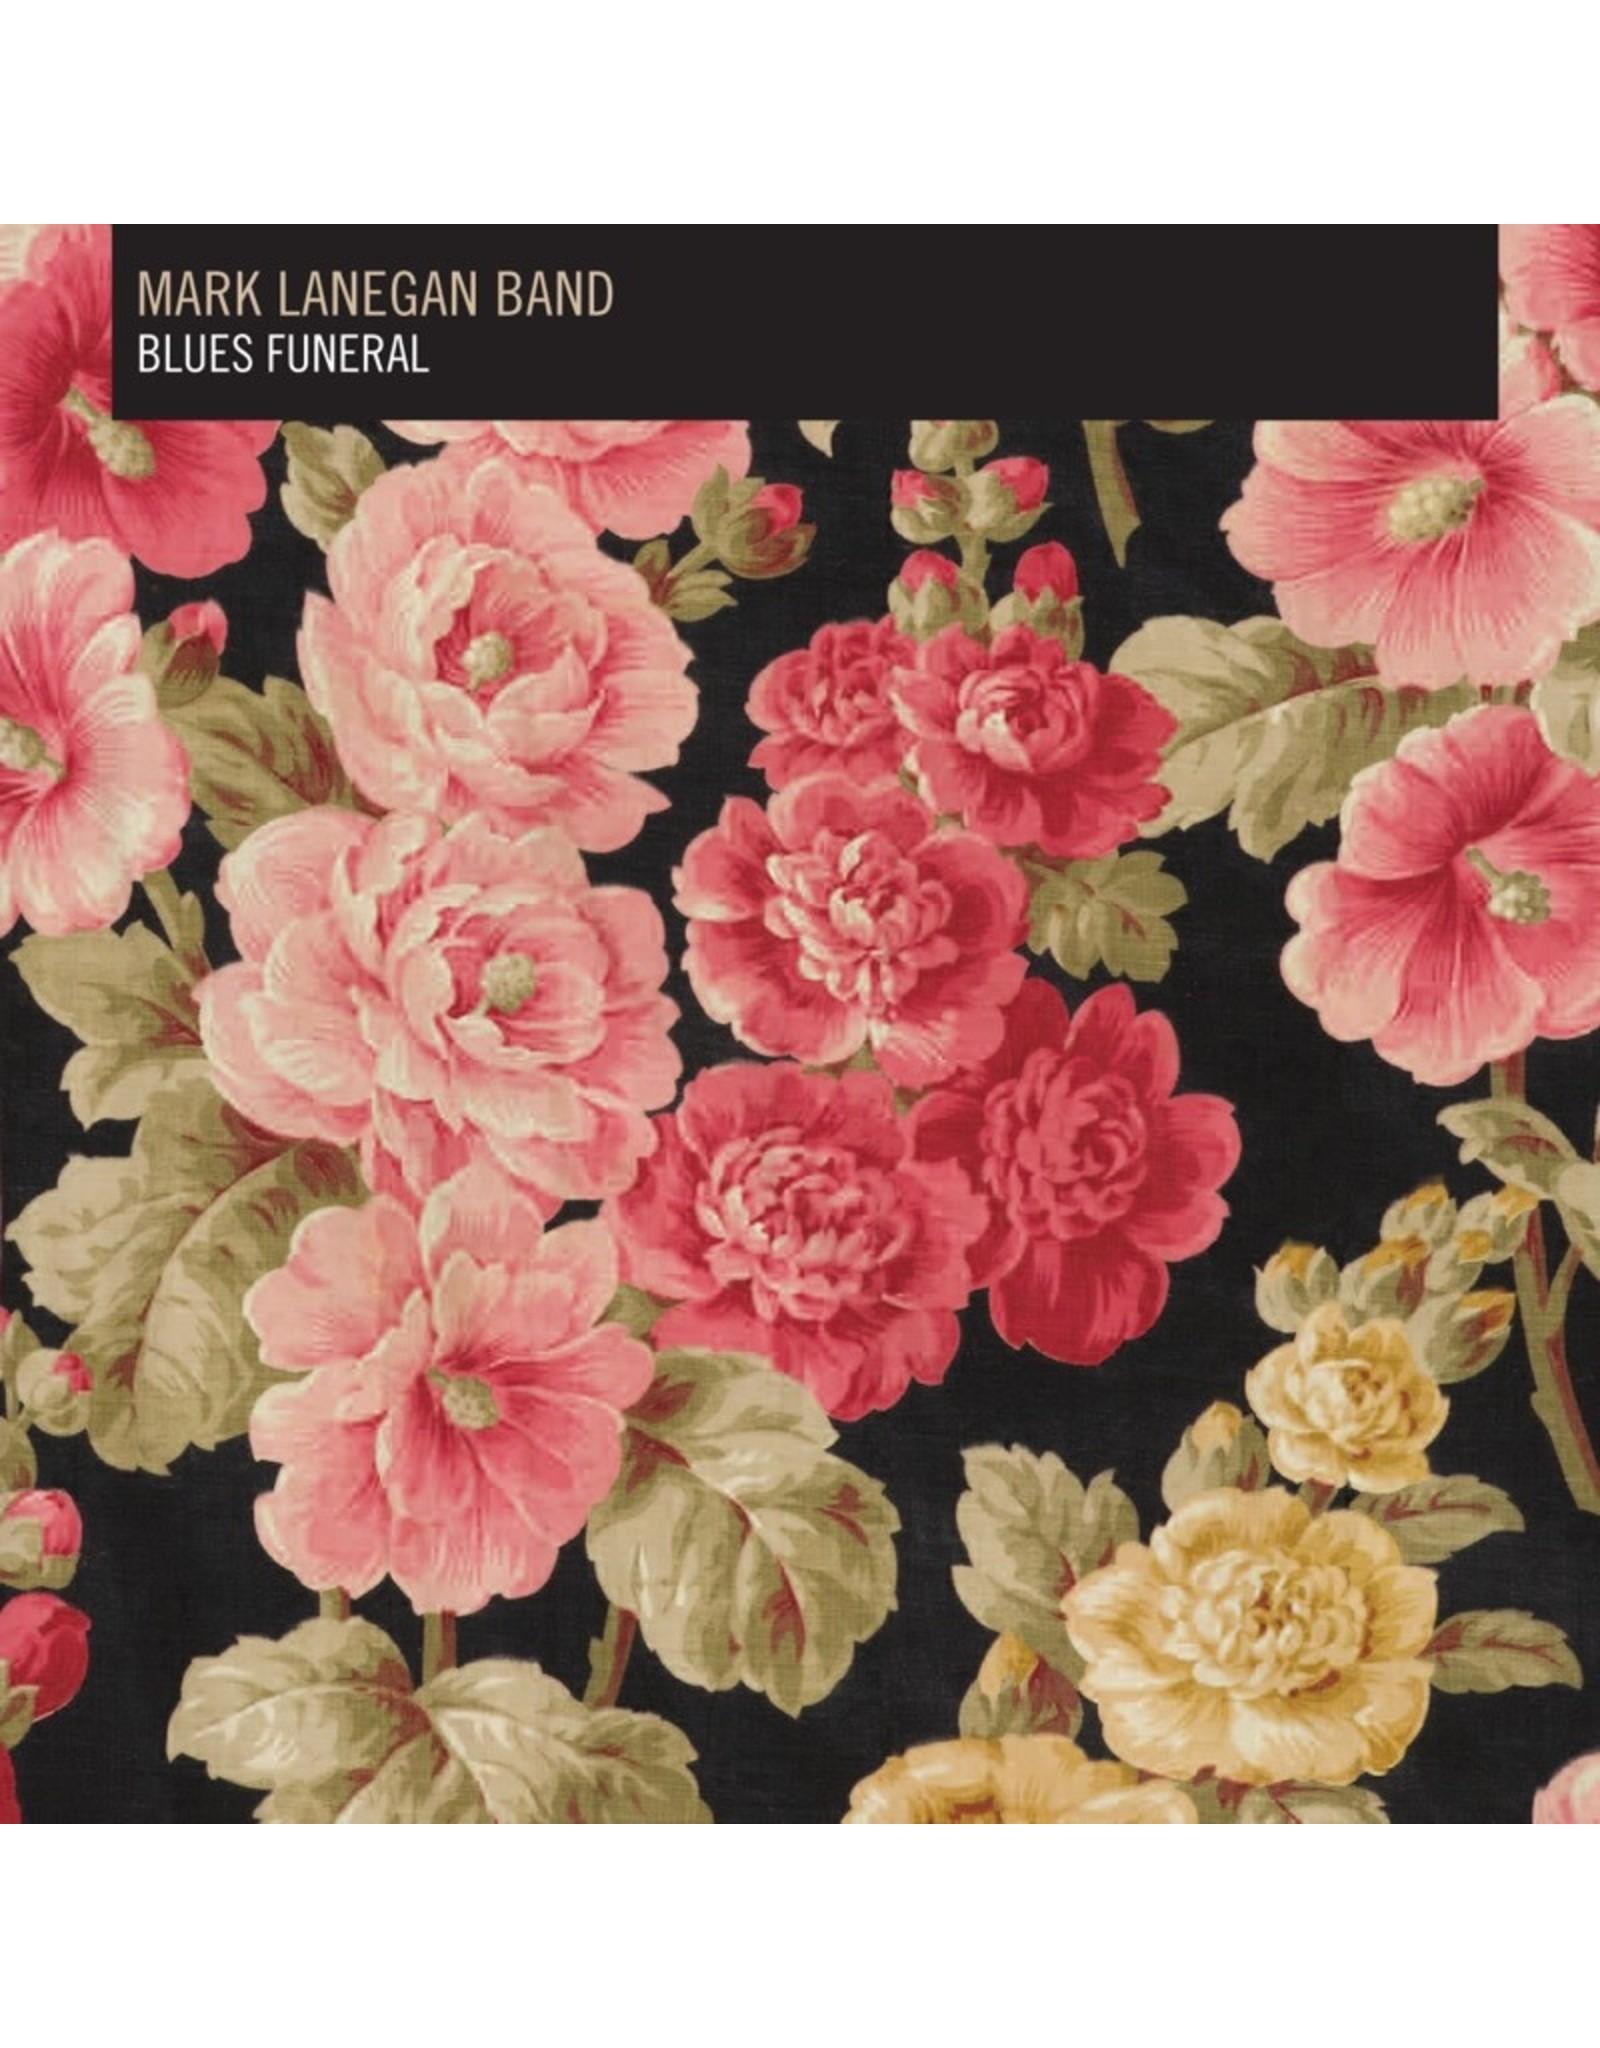 Mark Lanegan Band - Blues Funeral (Green Vinyl)